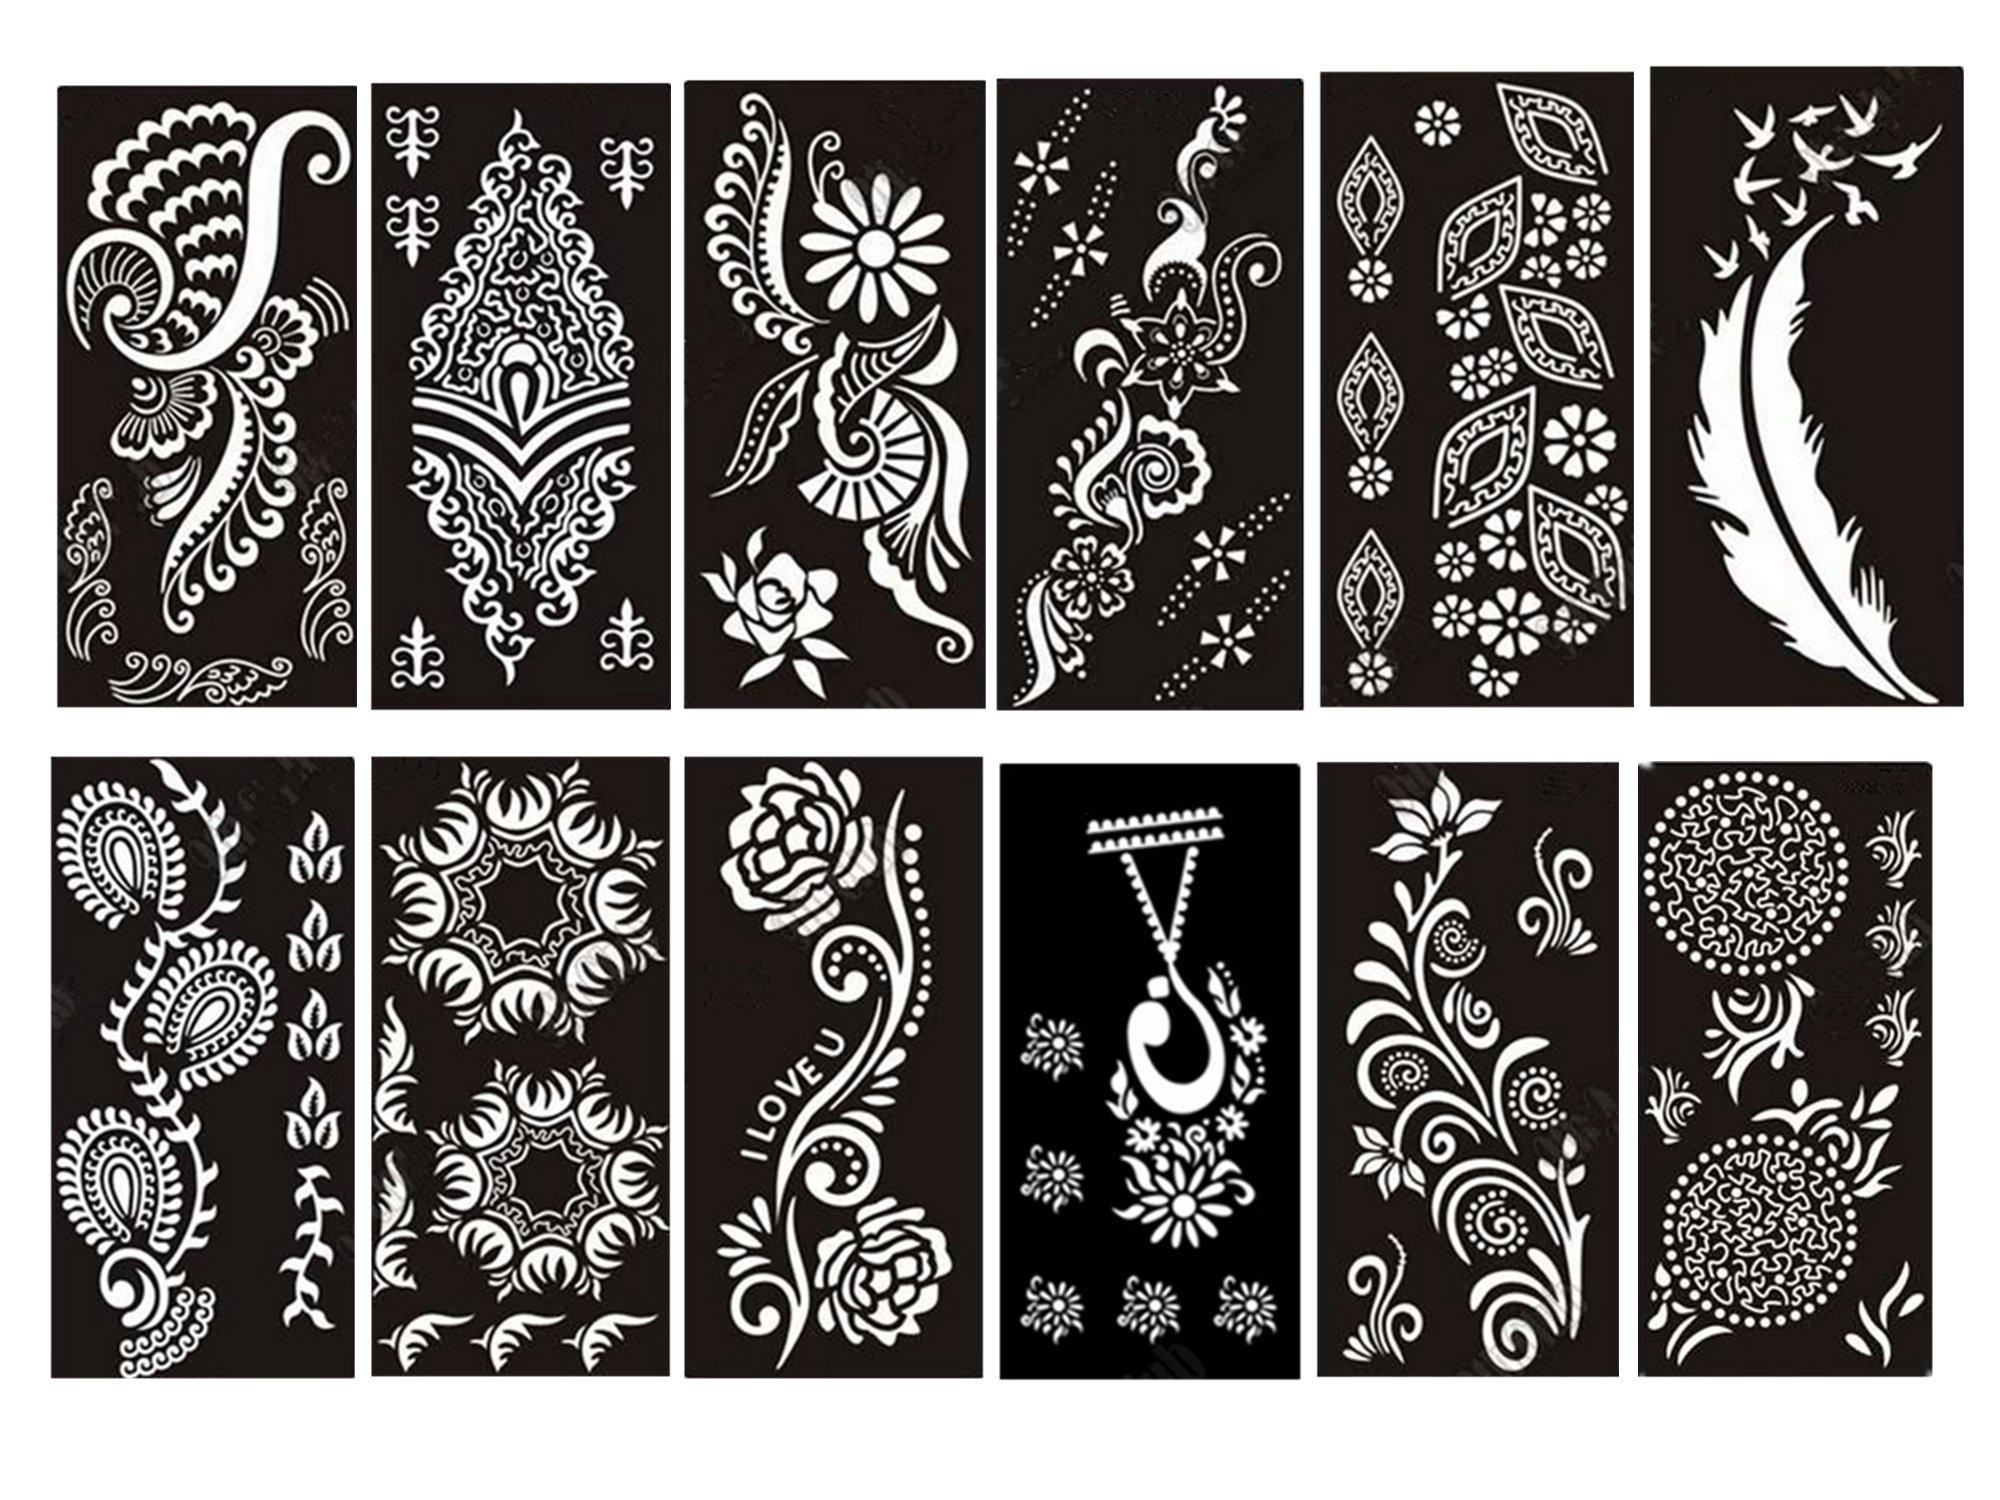 PACK of 12 Sheets Self-adhesive Tattoo Stencils Template for Henna Tattoo Body Art Painting Glitter Tattoos Airbrush Tattoo